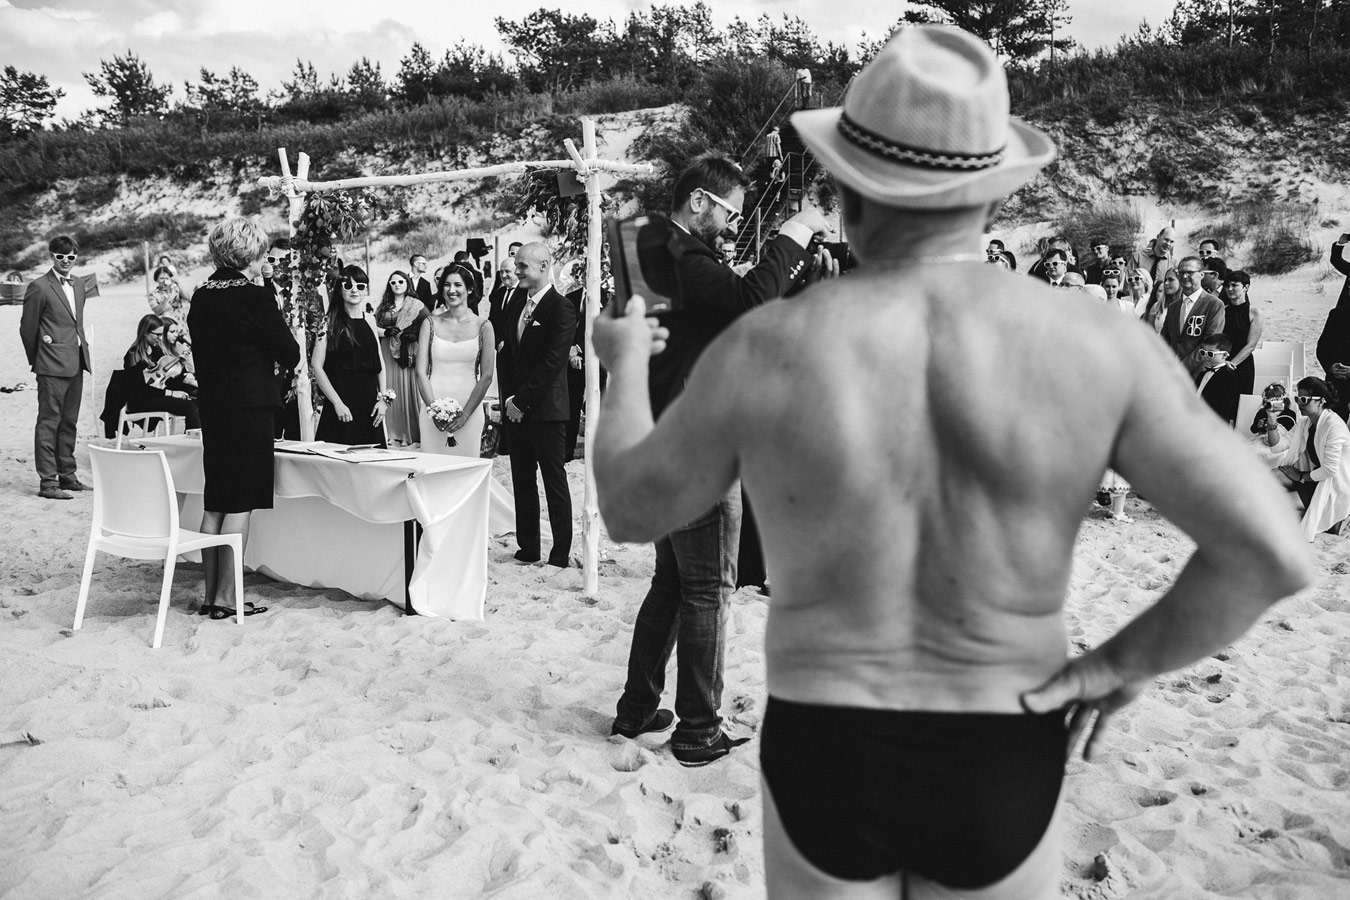 © Marcin Bublewicz   Elementy Bieli, Gryfice, Poland, 2st place in category Professional : Destination Weddings, Rangefinder Wedding Contest 2017 Winners